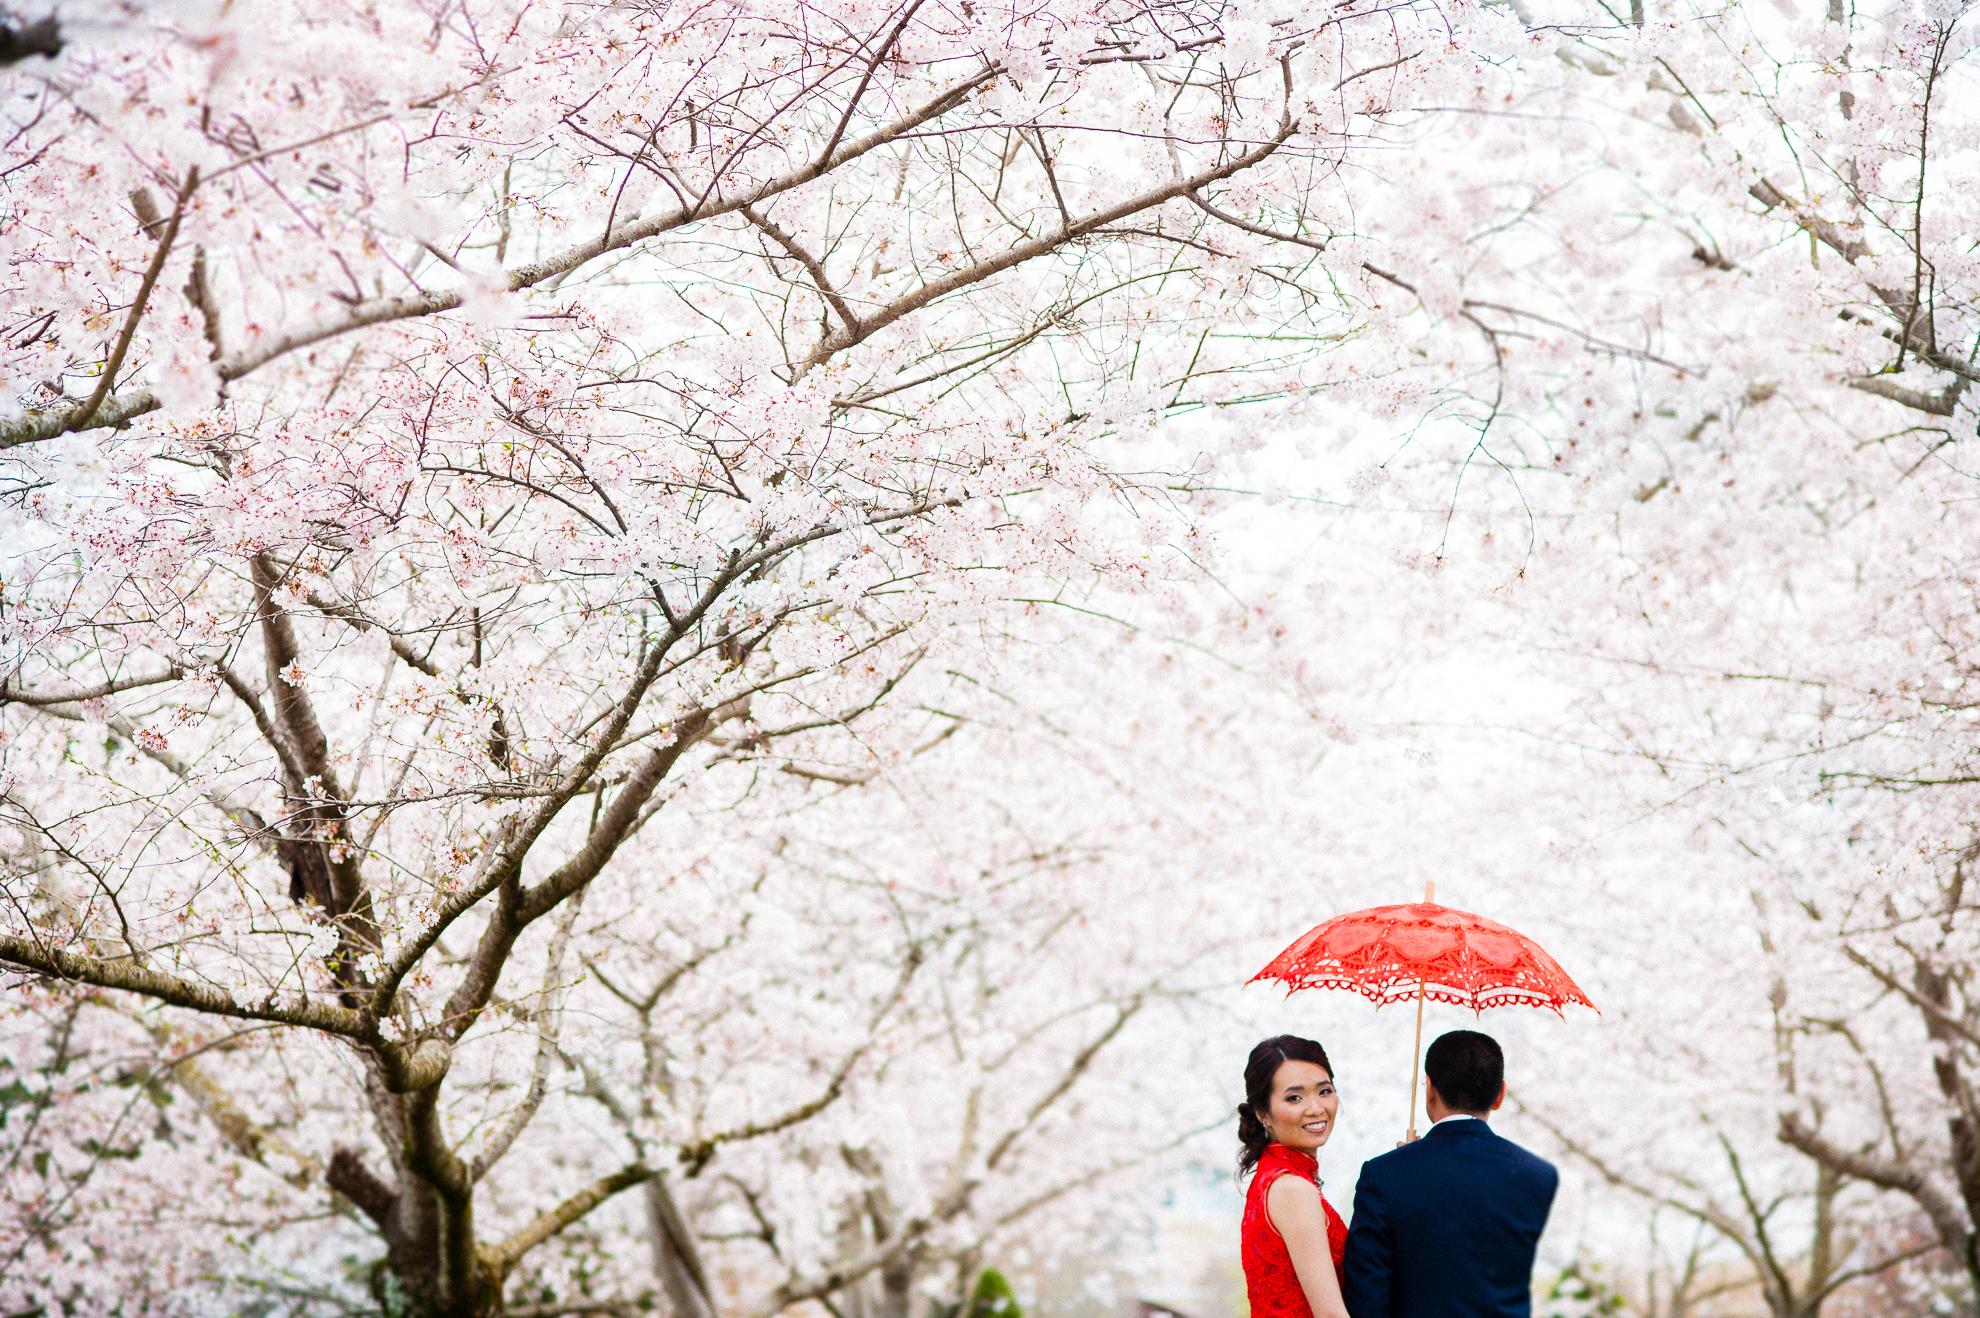 chinese wedding portrait under cherry trees